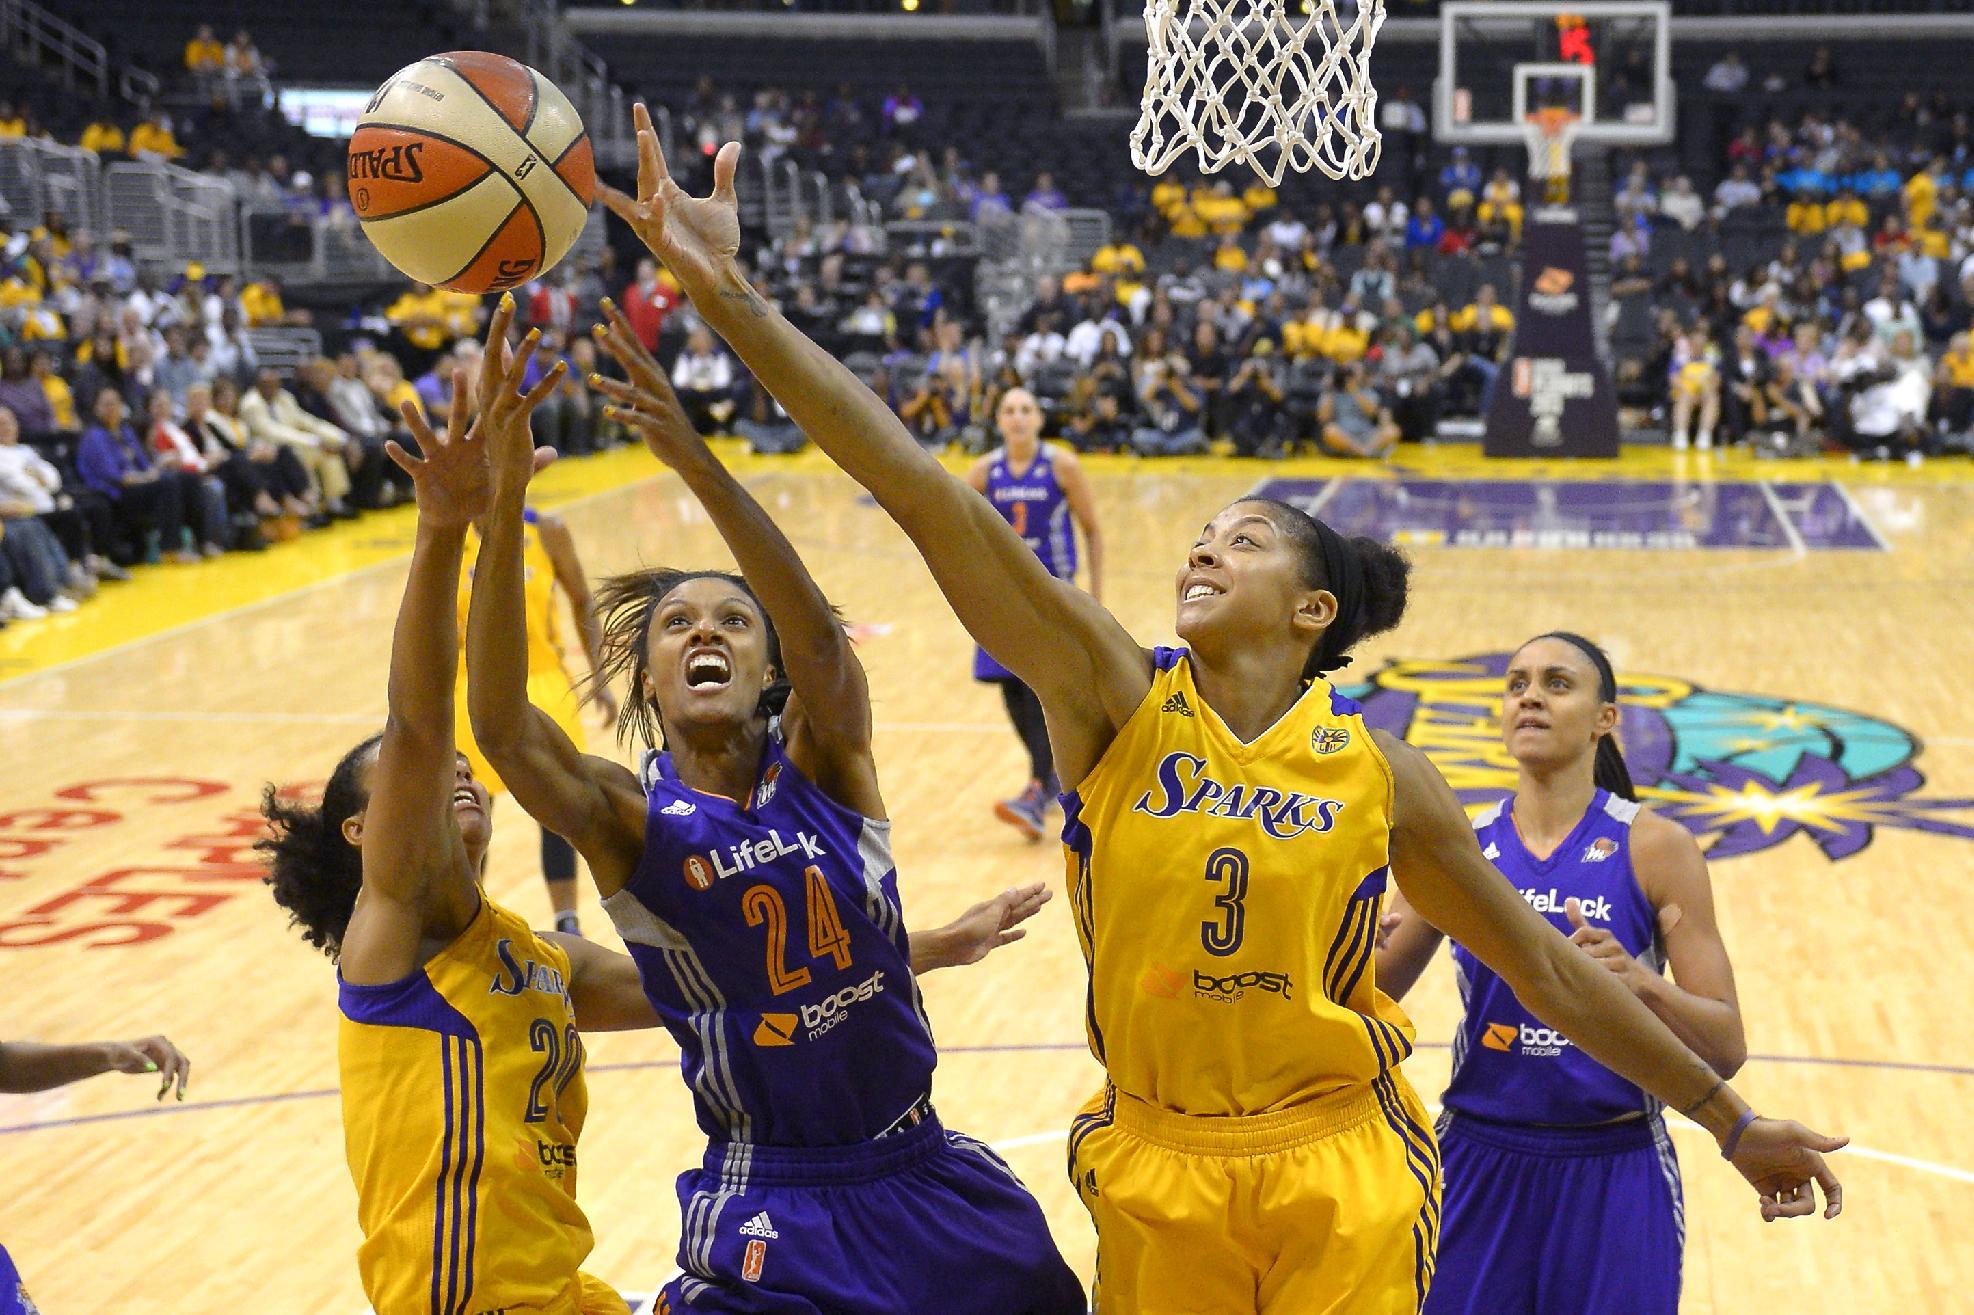 Mercury beat Sparks 78-77 on Griner's late basket